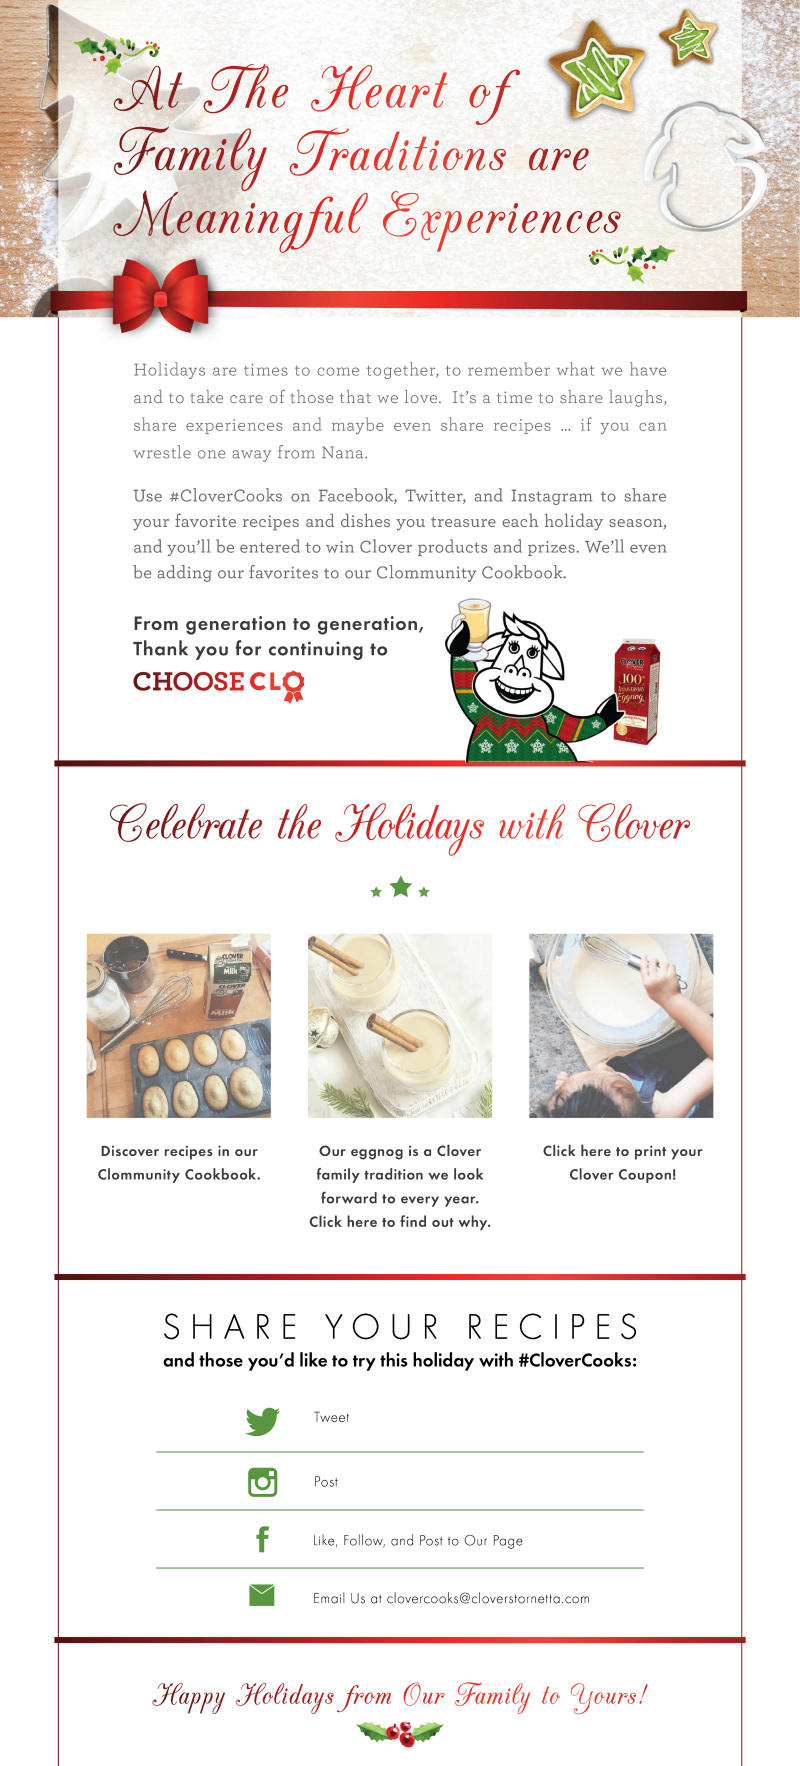 #CloverCooks Holiday Clommunity Cookbook